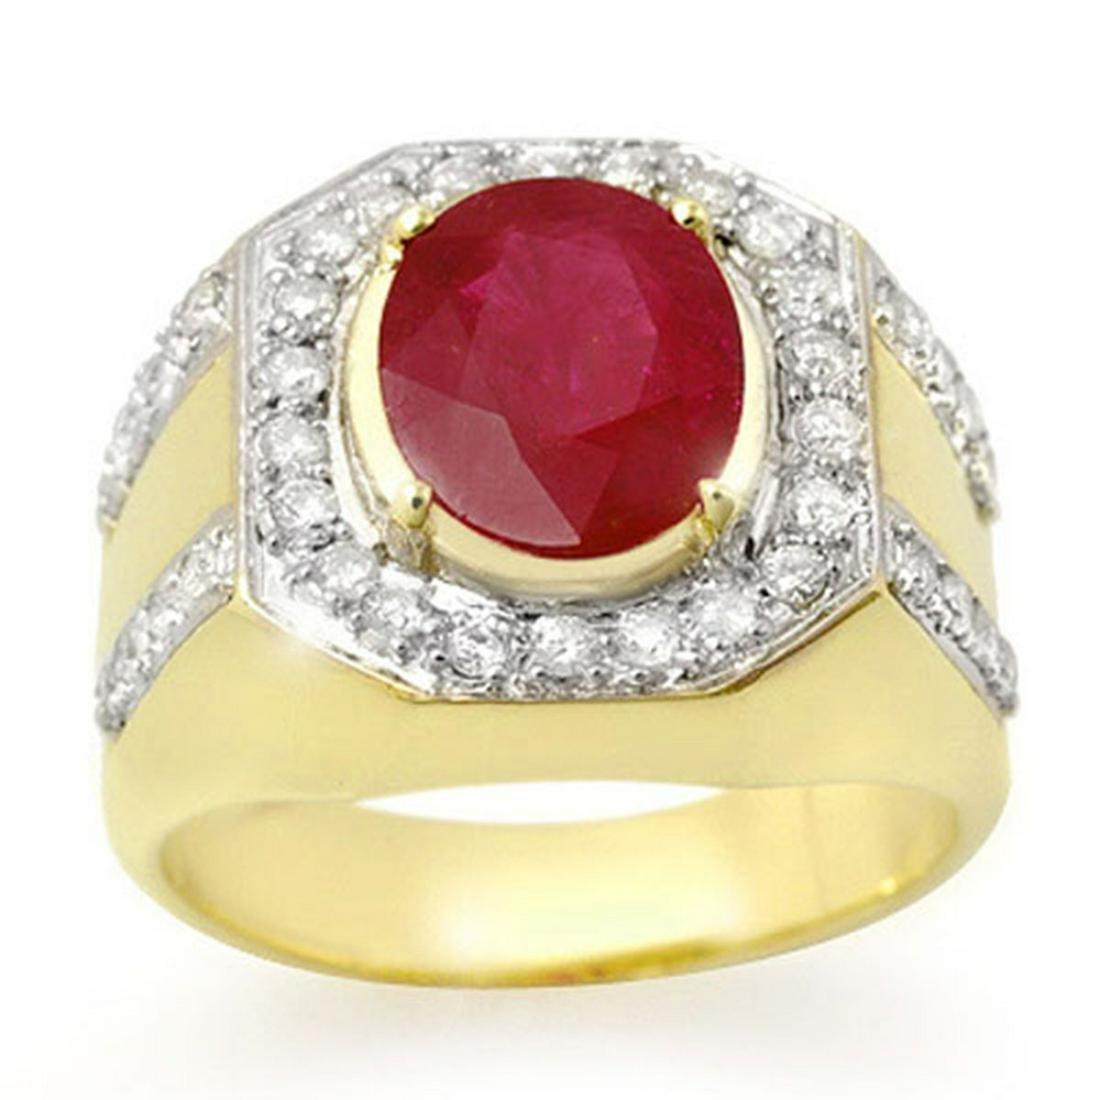 4.75 ctw Ruby & Diamond Men's Ring 10K Yellow Gold -